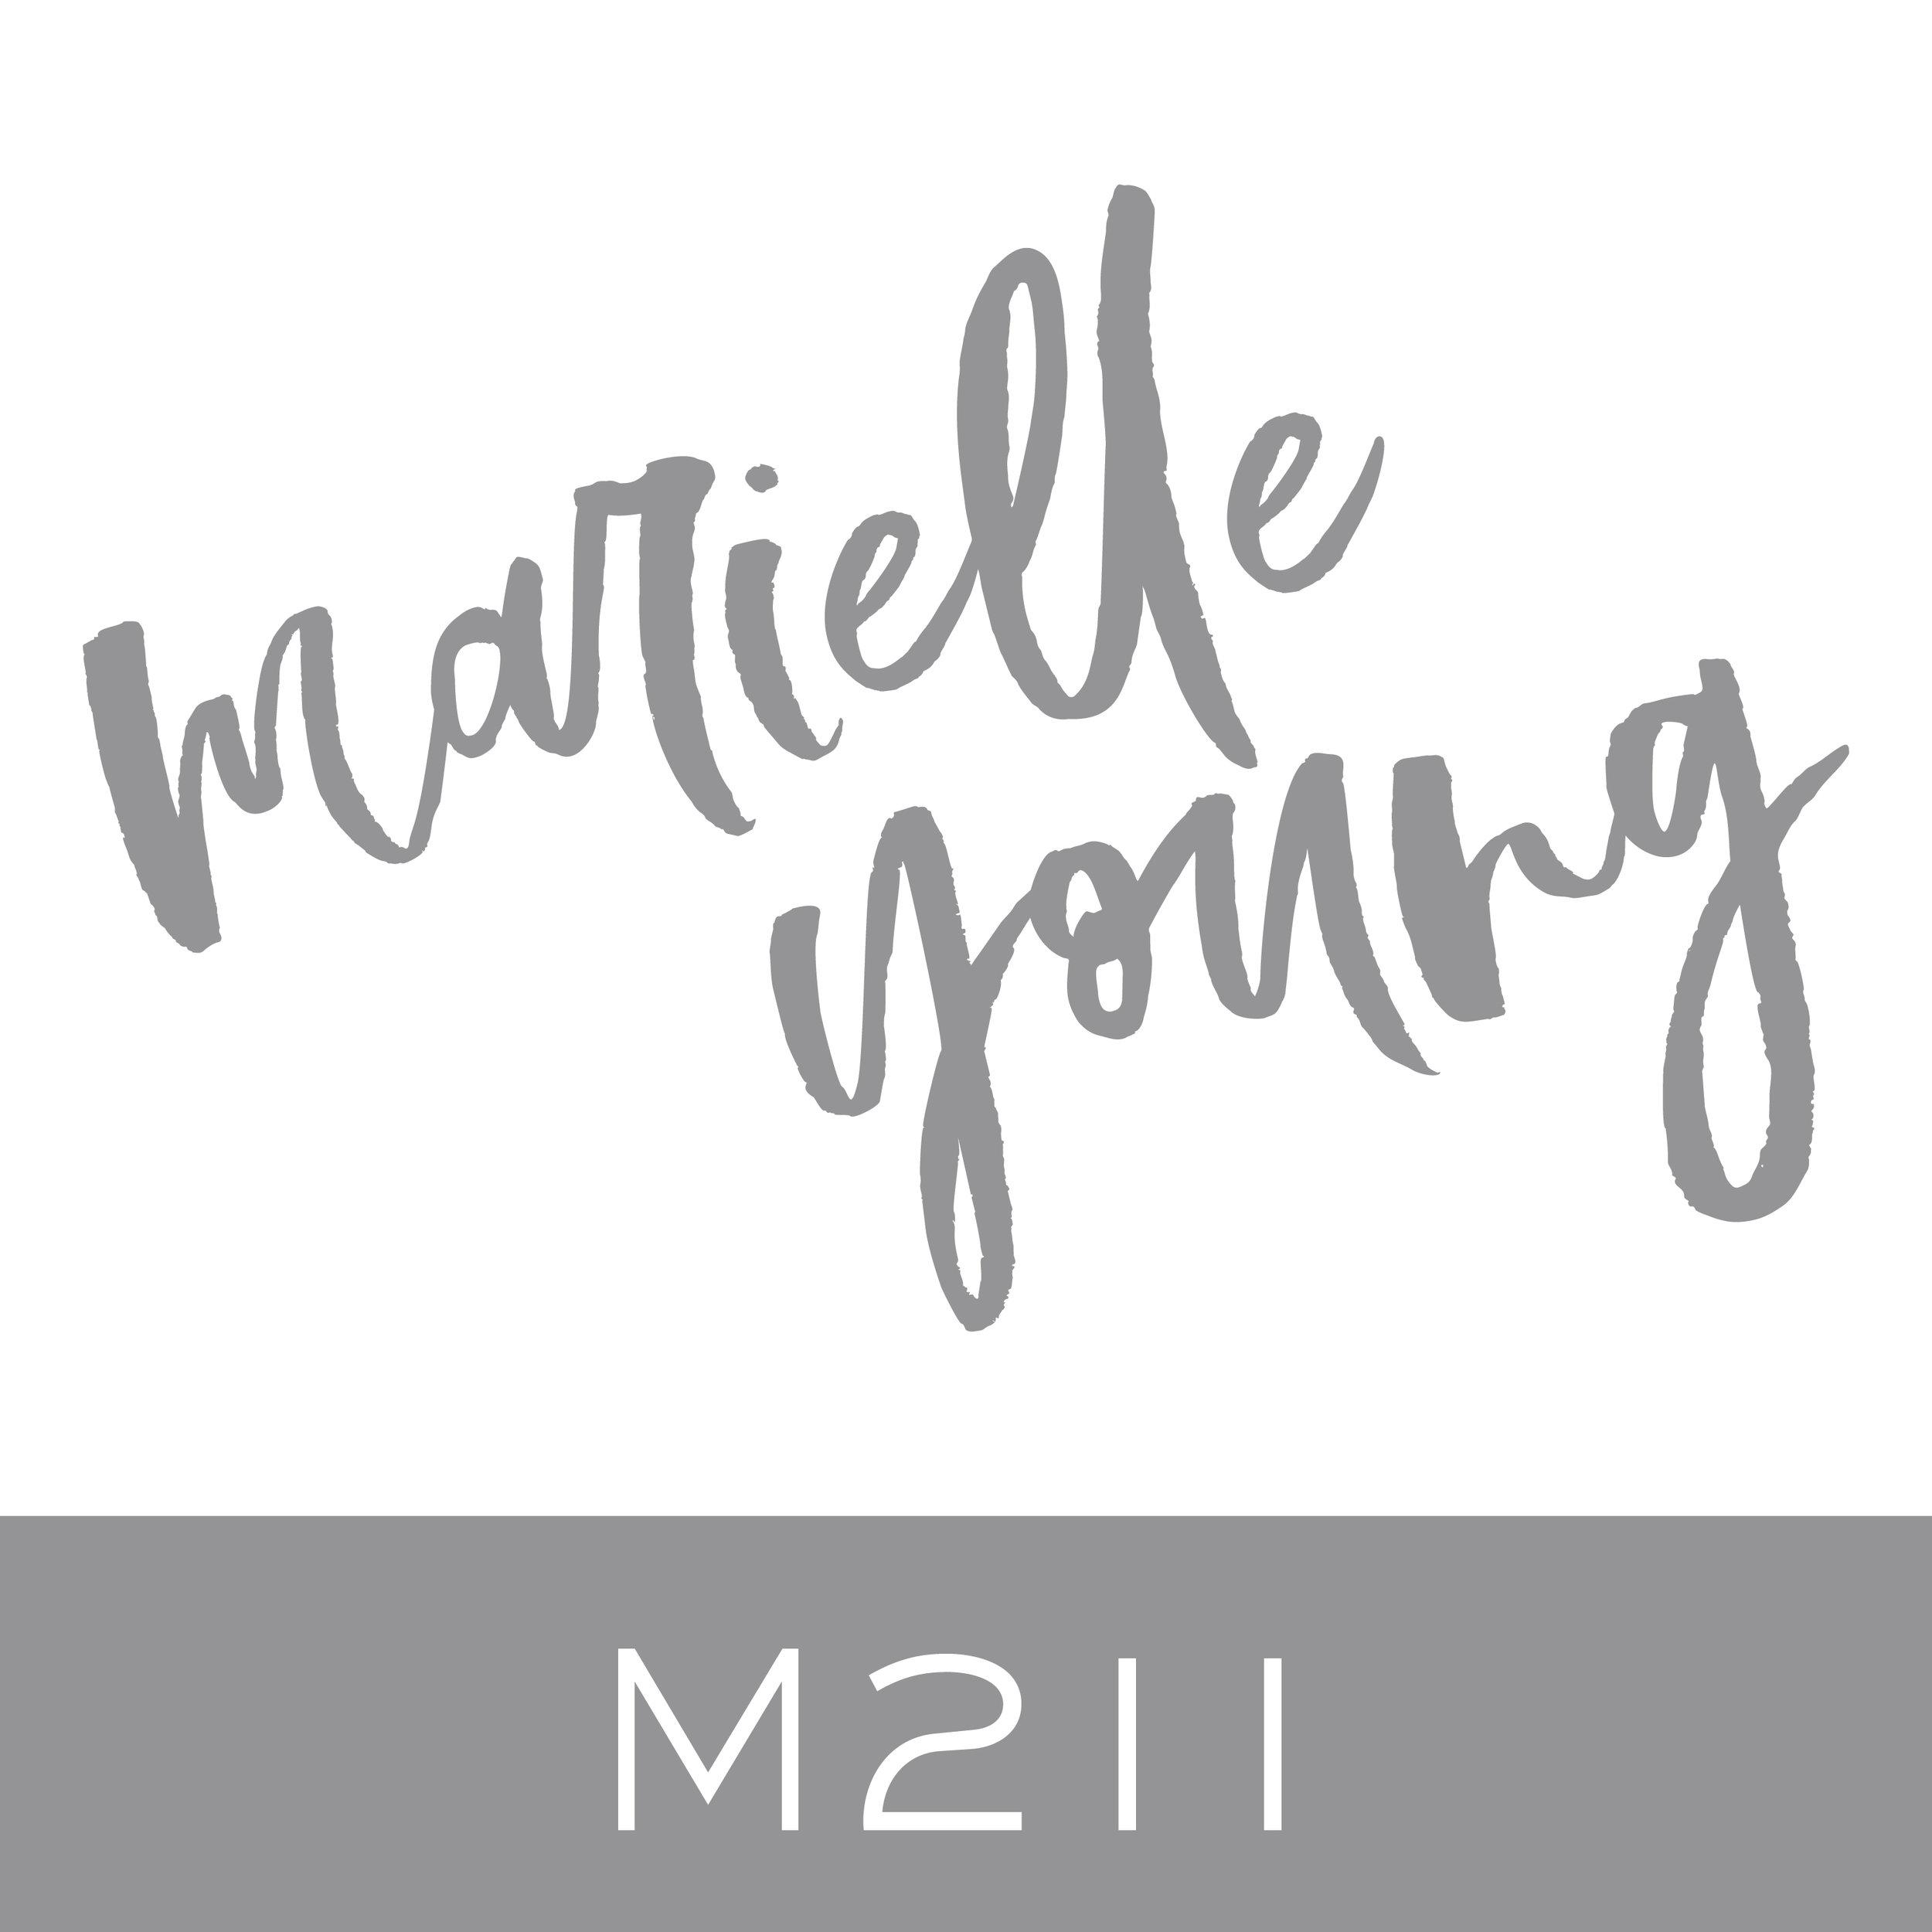 M211.jpg